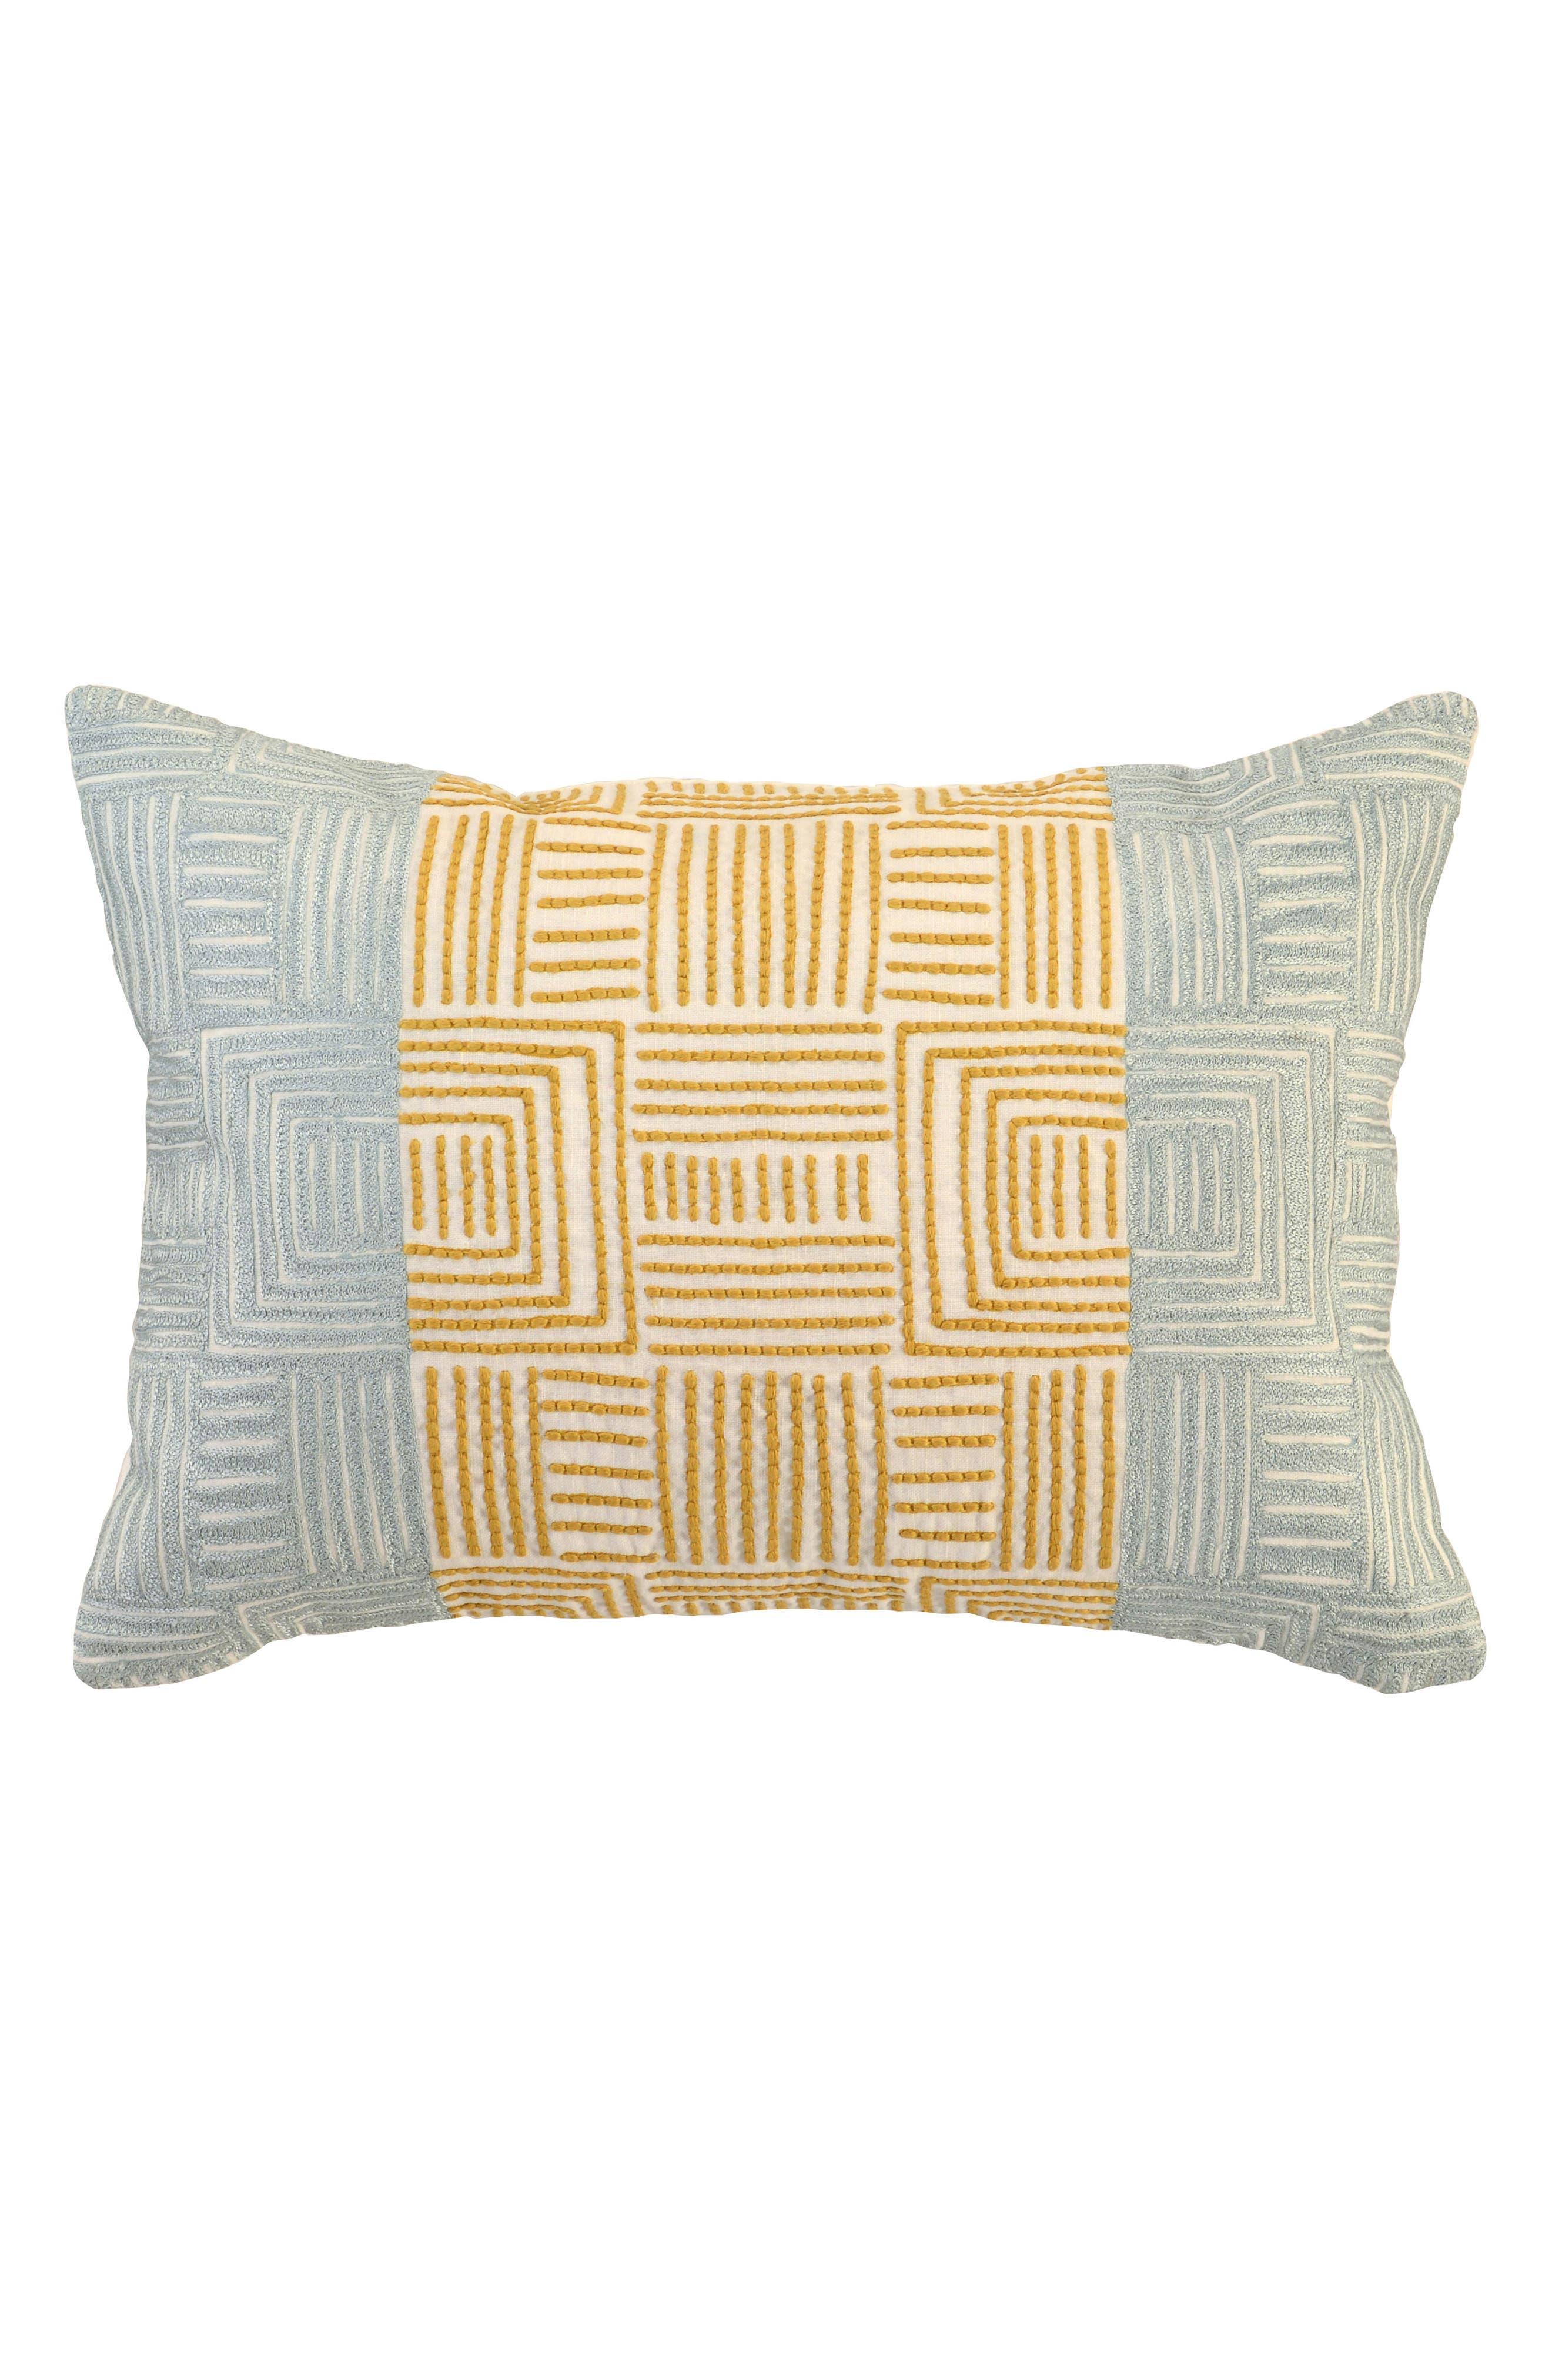 Villa Home Collection Dixon Ocre Tidal Accent Pillow